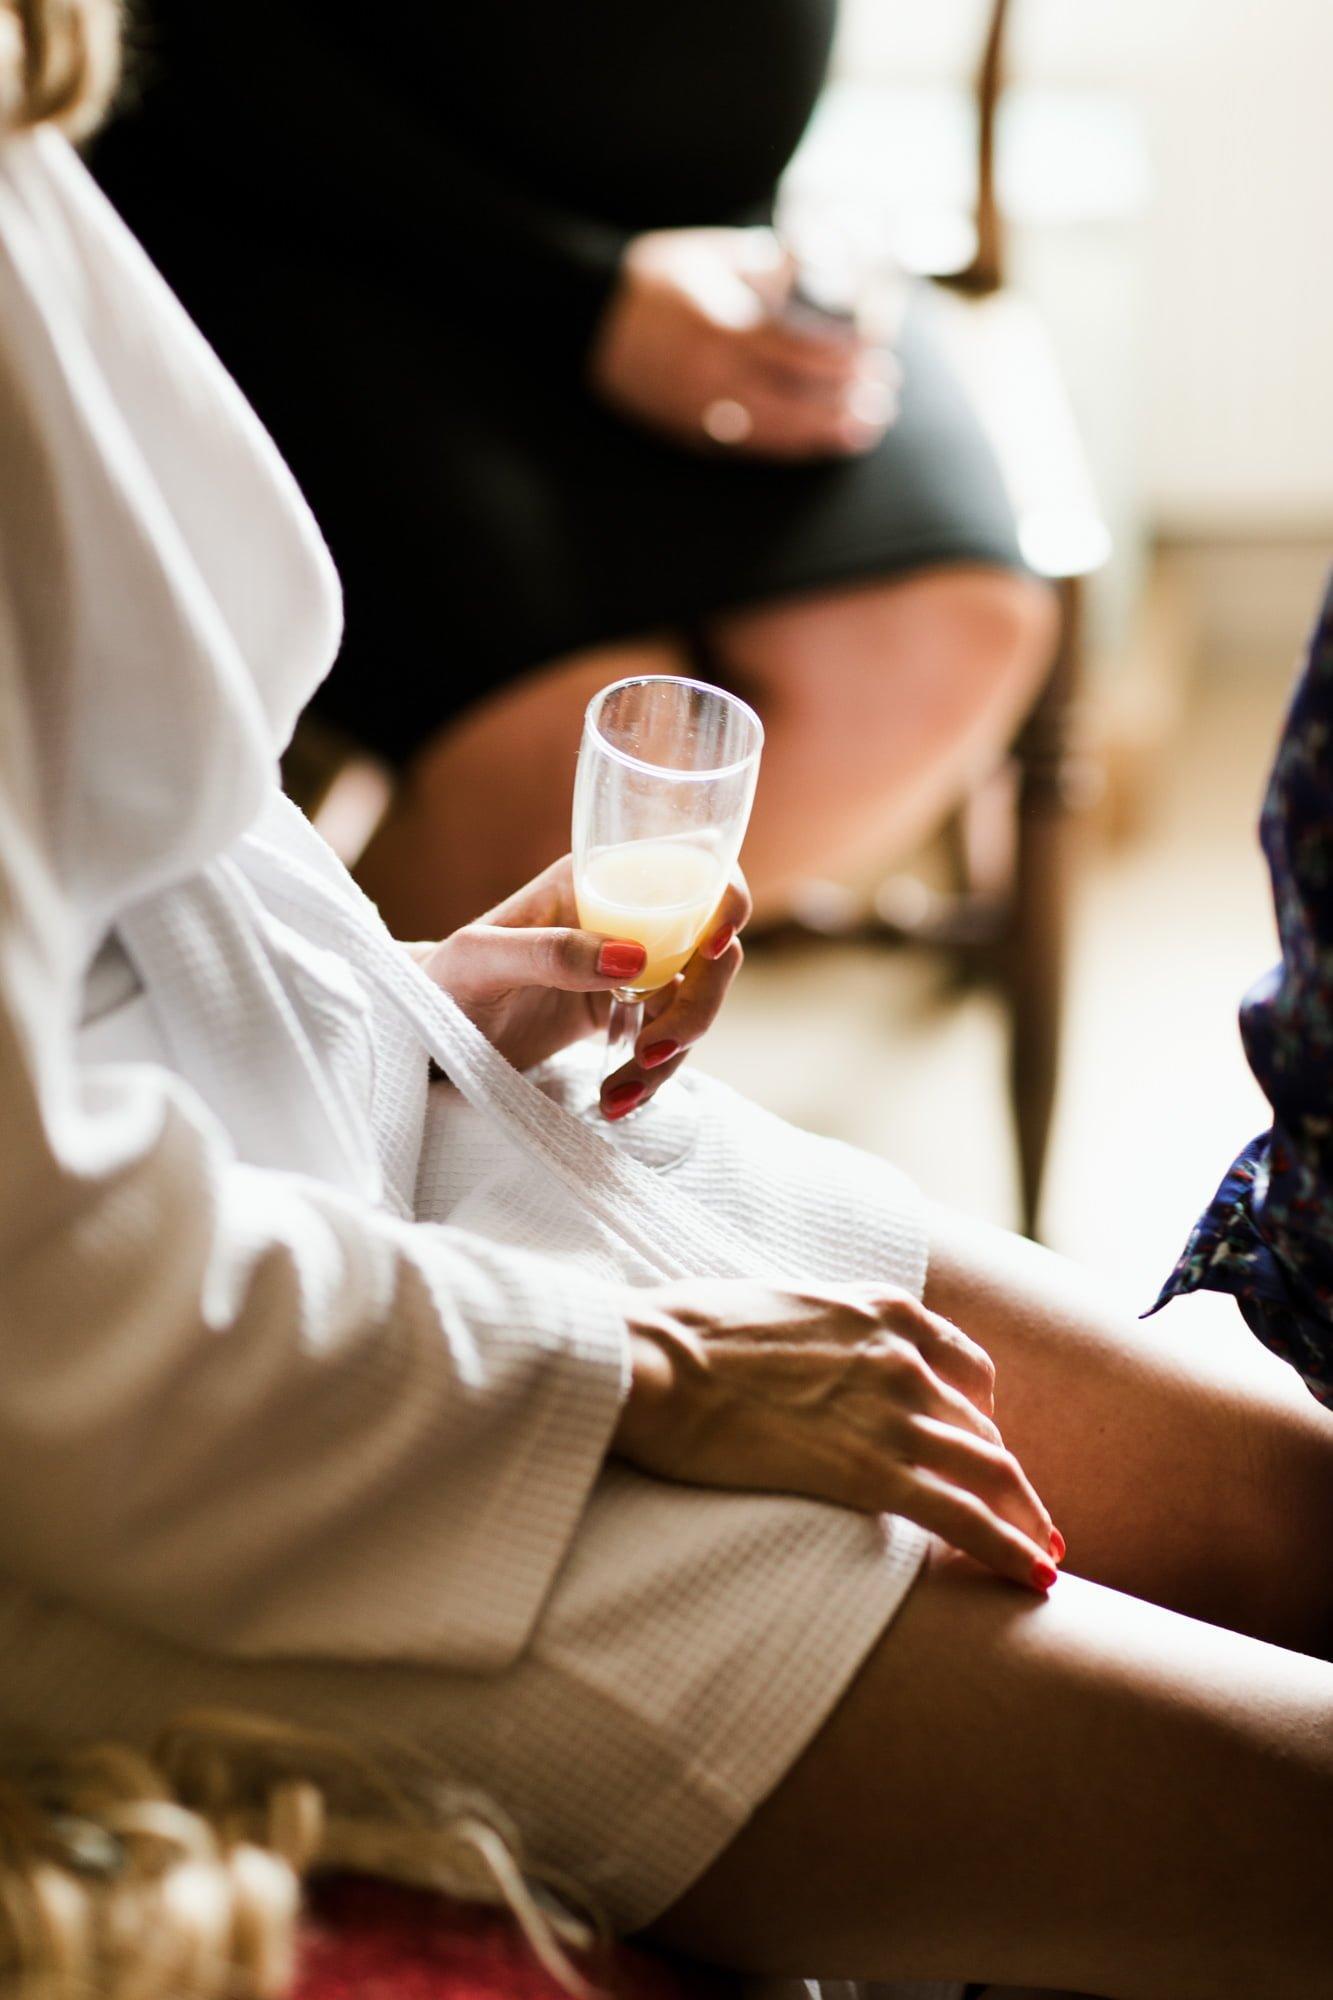 boho-suffolk-polsteadchurch-wedding-tipiwedding-carlaandtoby